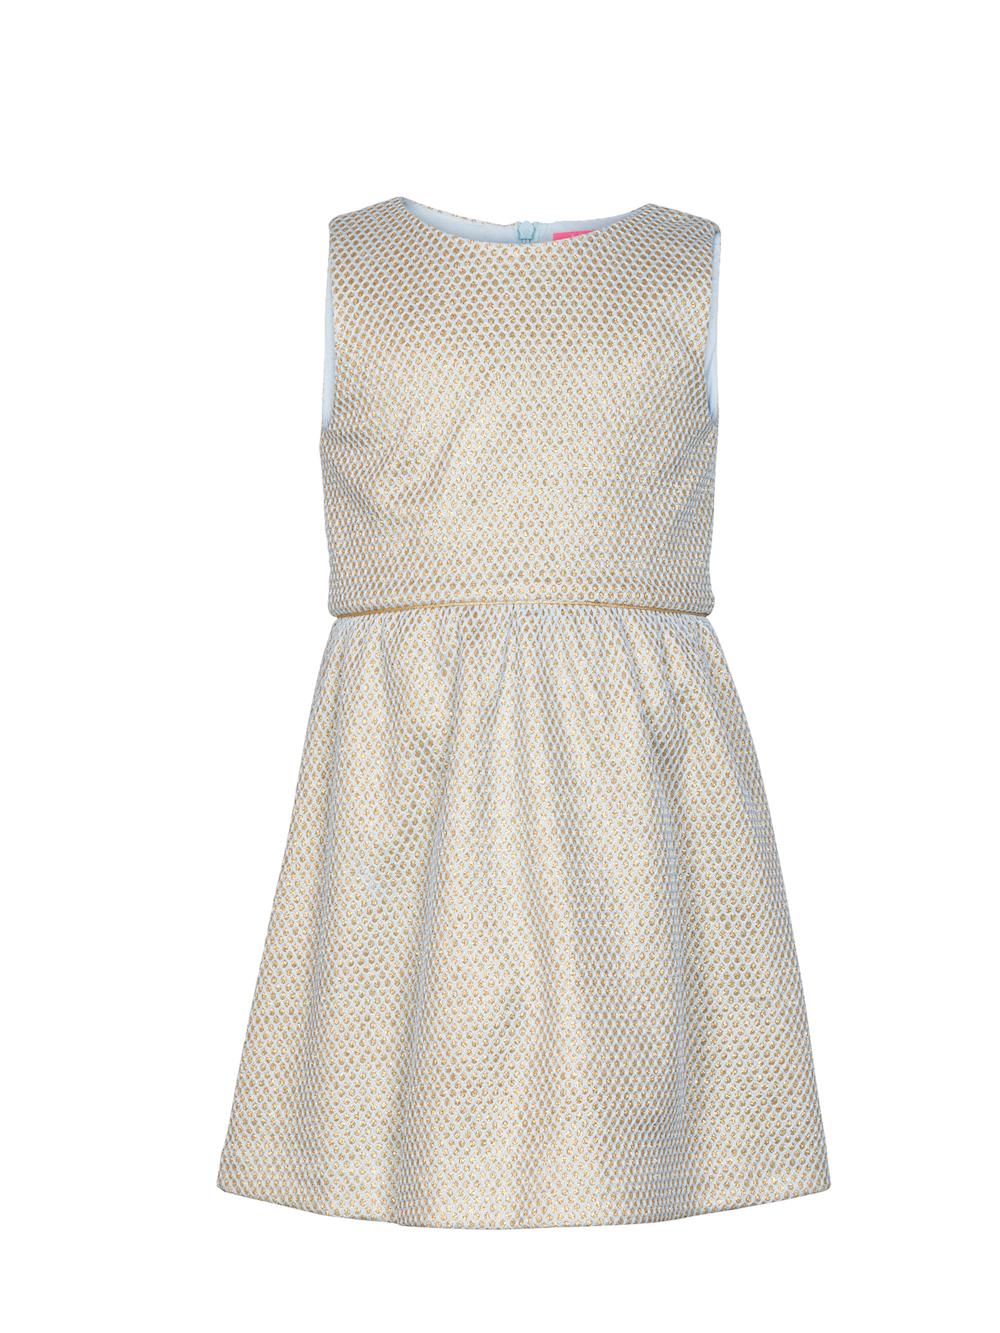 8d54d8c537712d Le Big Ireen dress jurk blauw en goud - Minipop